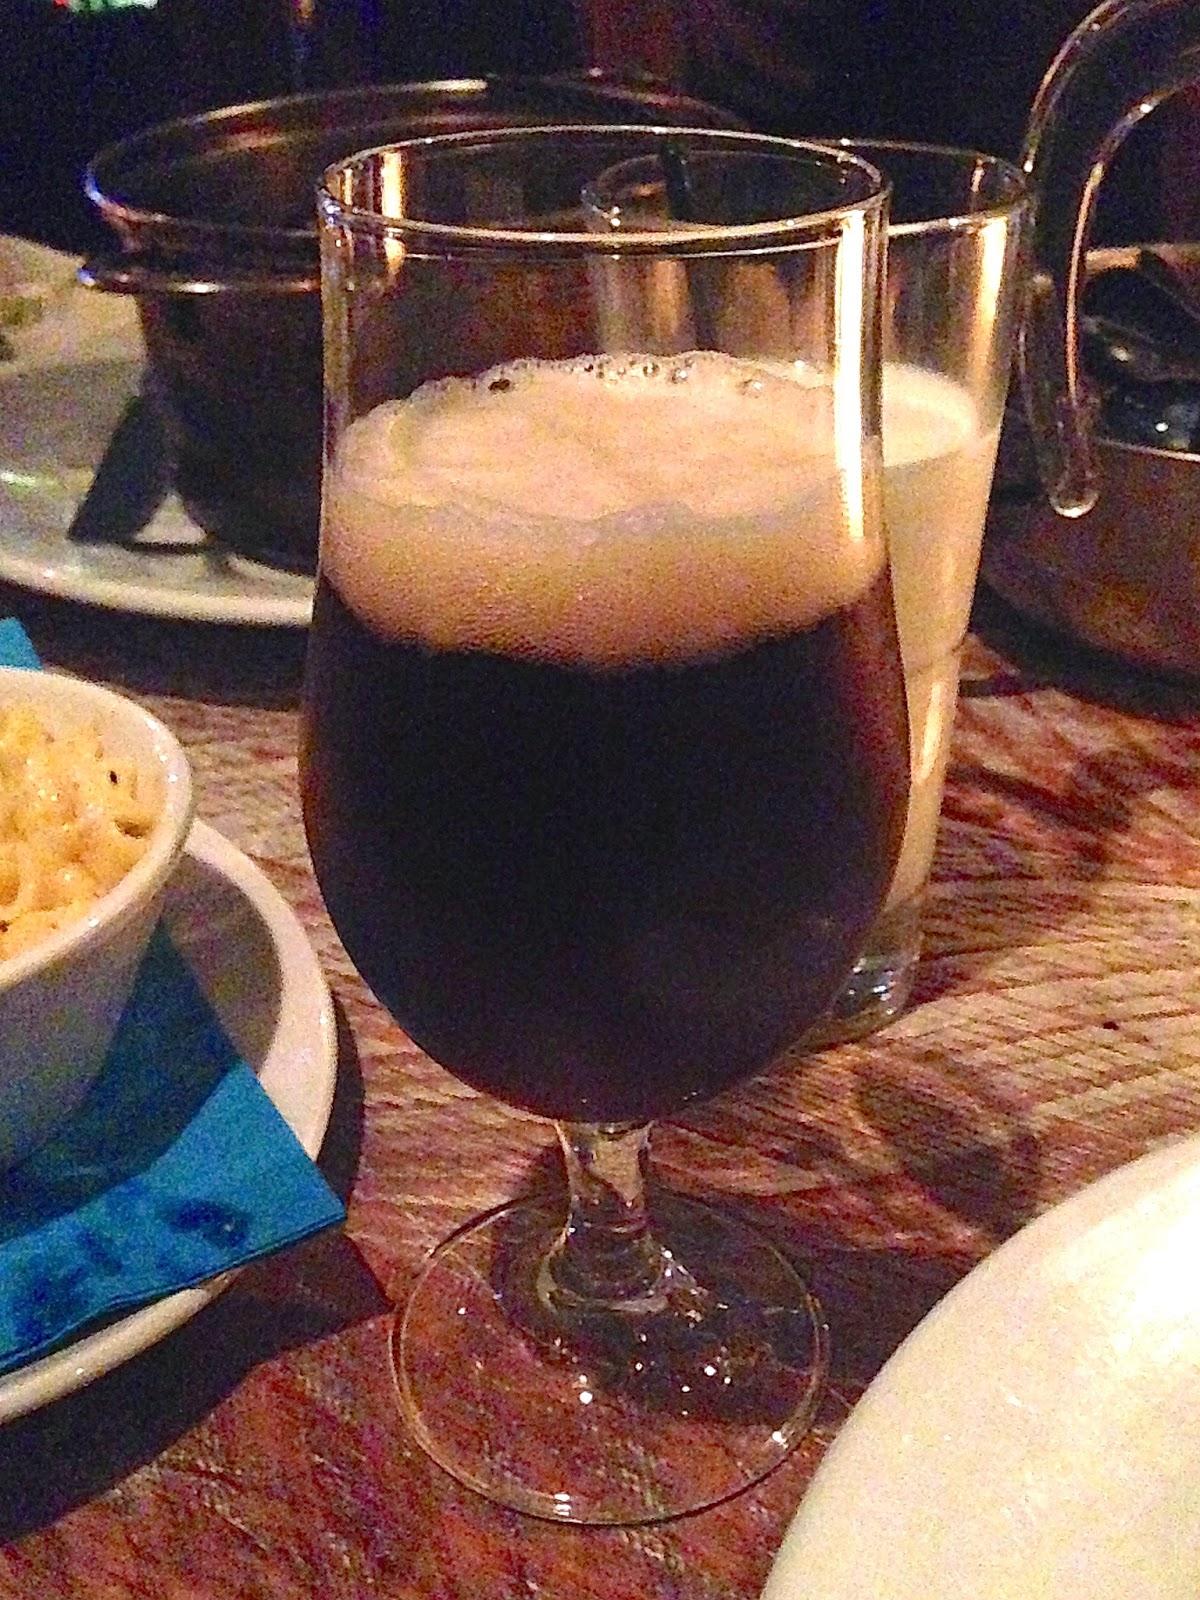 Pint of Westvleteren XII, the best beer in the world